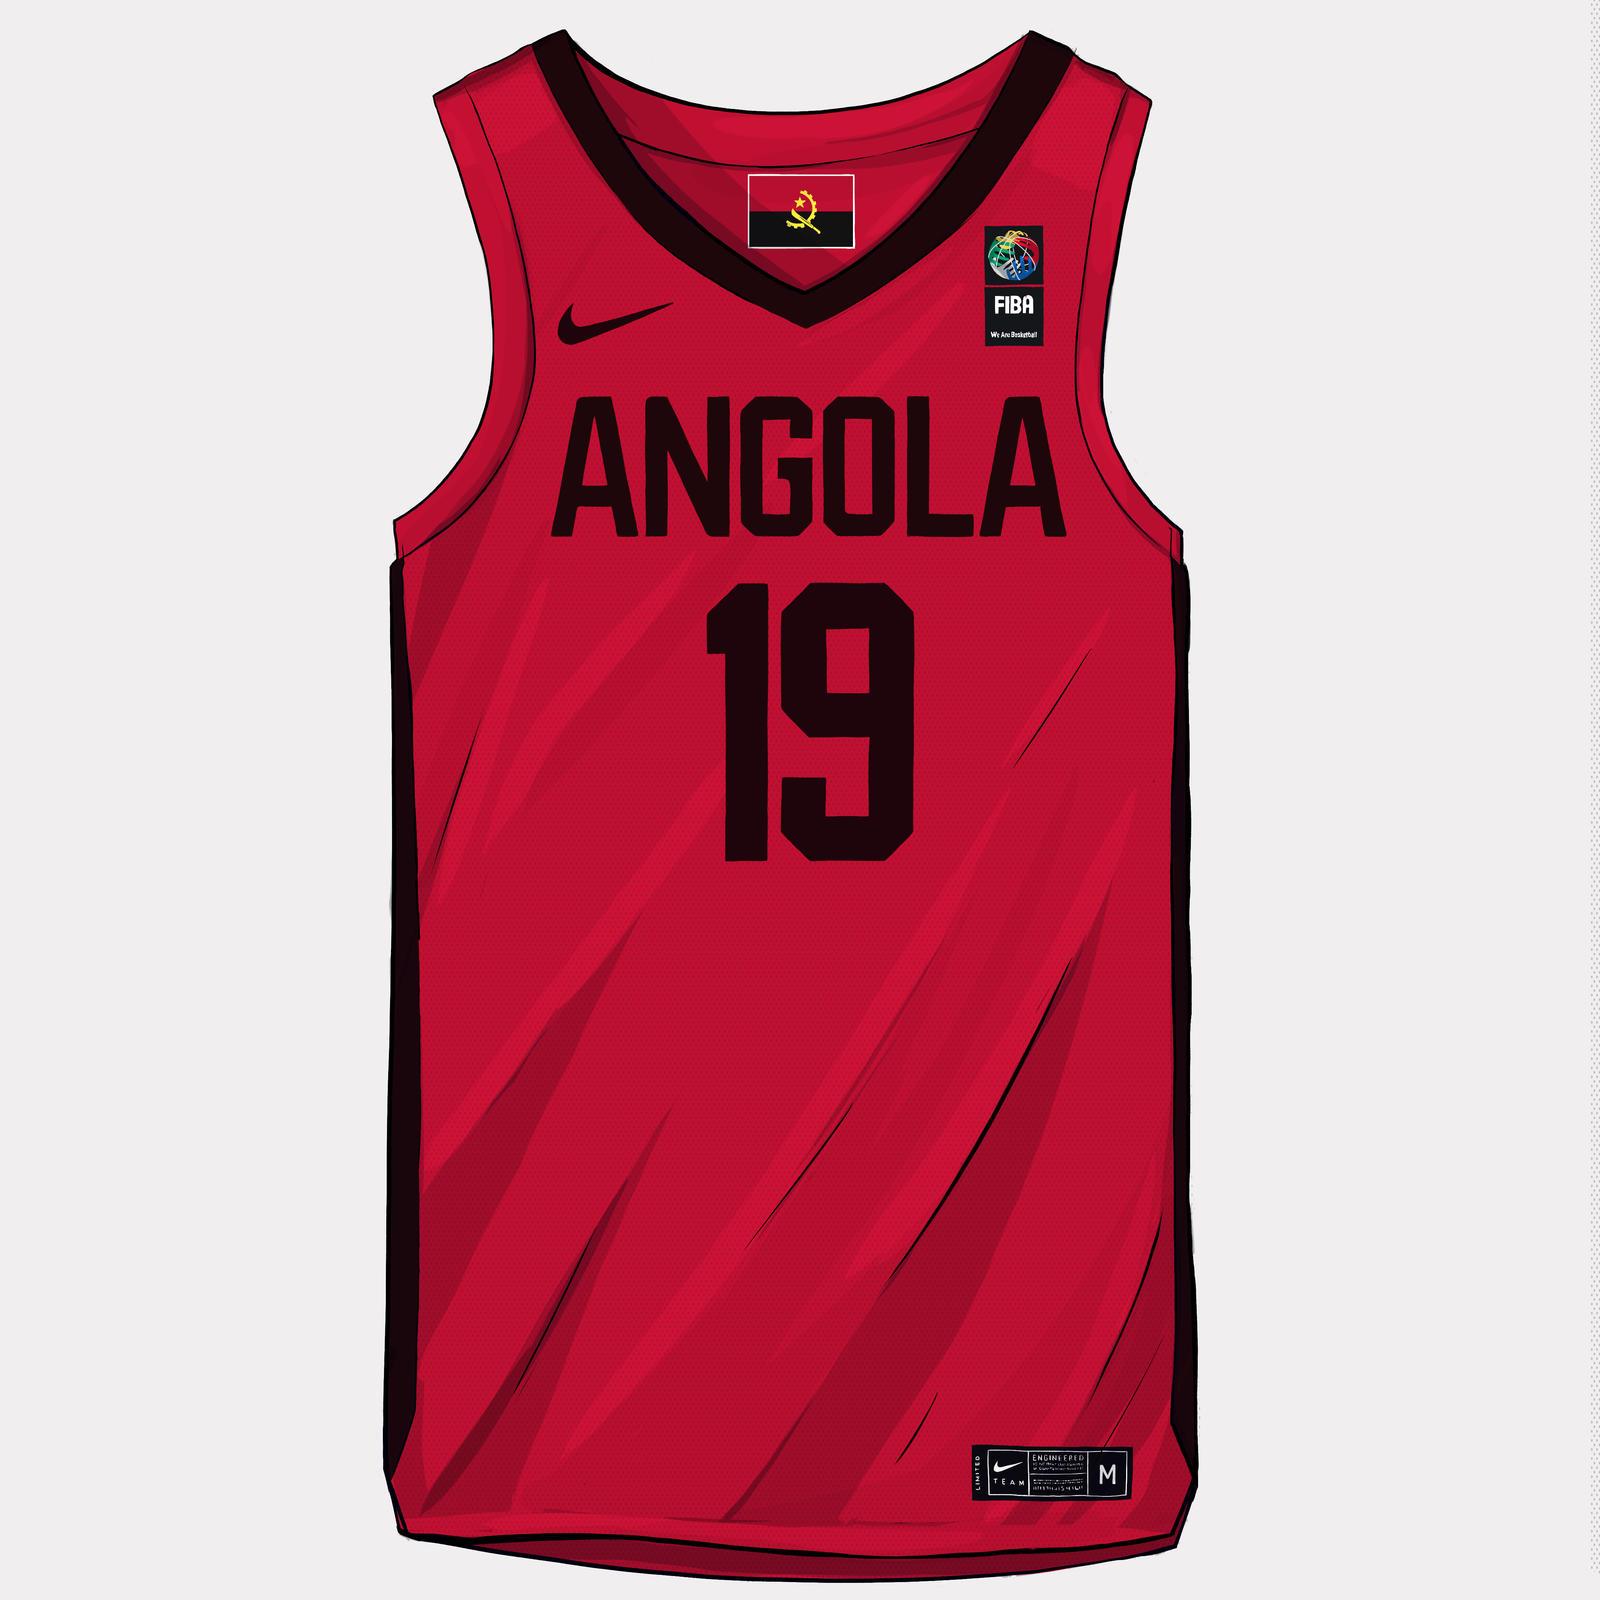 nike-news-angola-national-team-kit-2019-illustration-1x1_1_square_1600.jpg